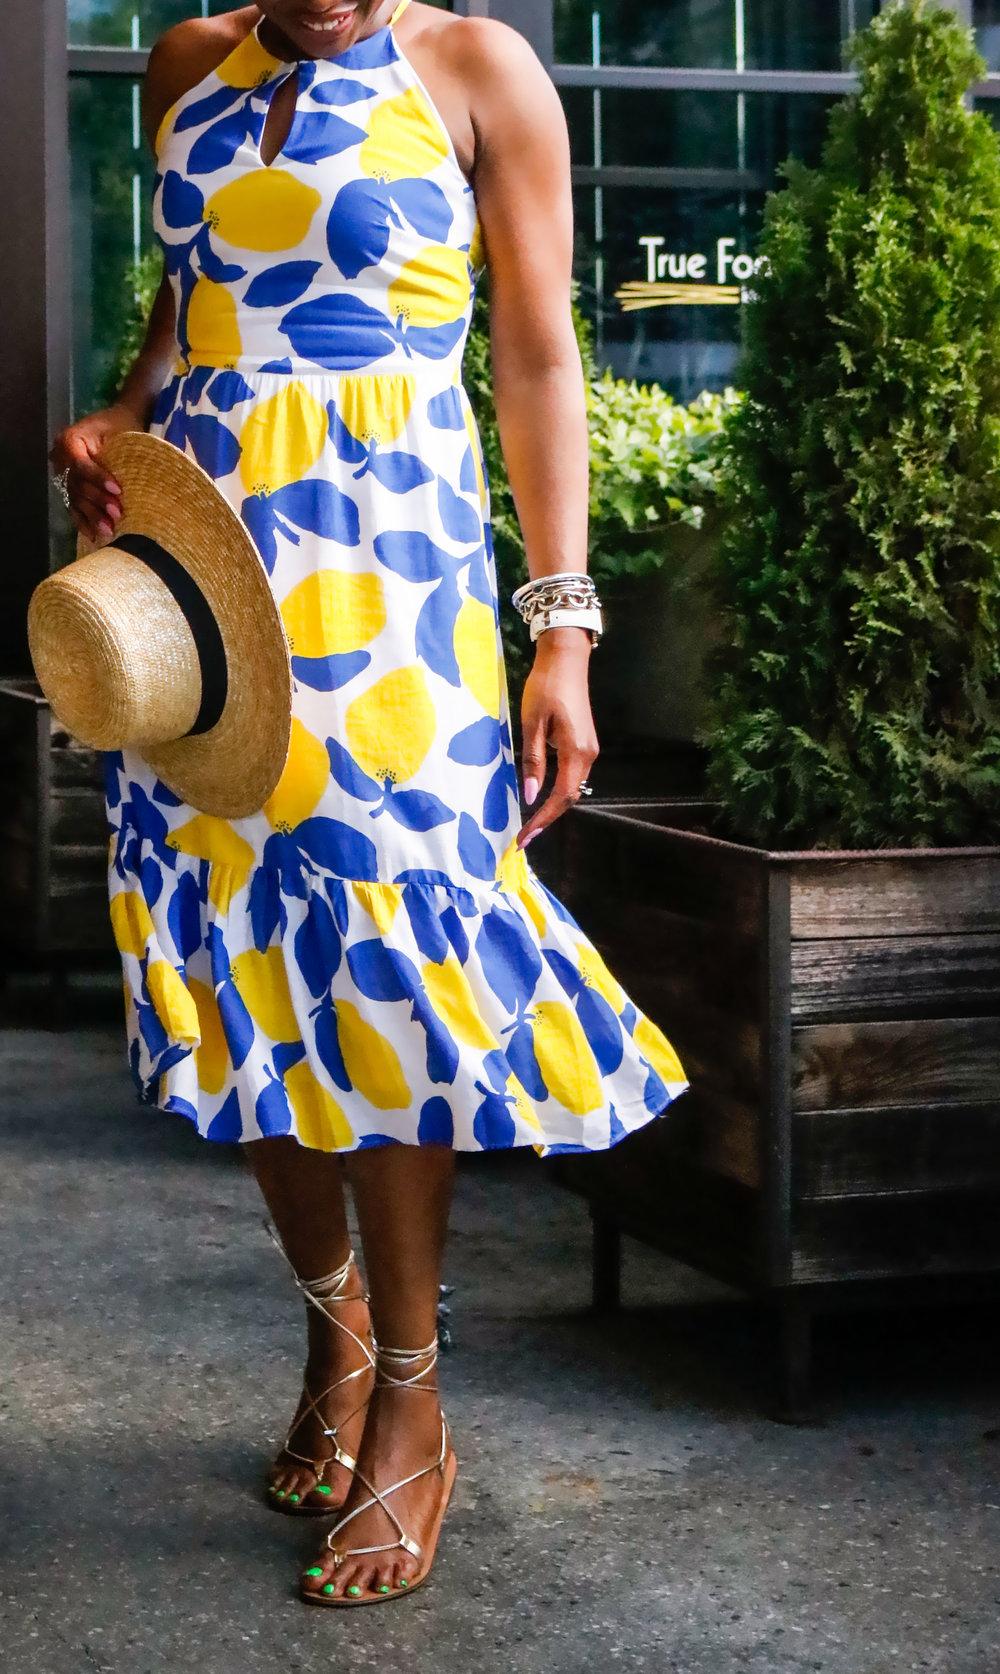 BLUE AND YELLOW DRESS.jpg